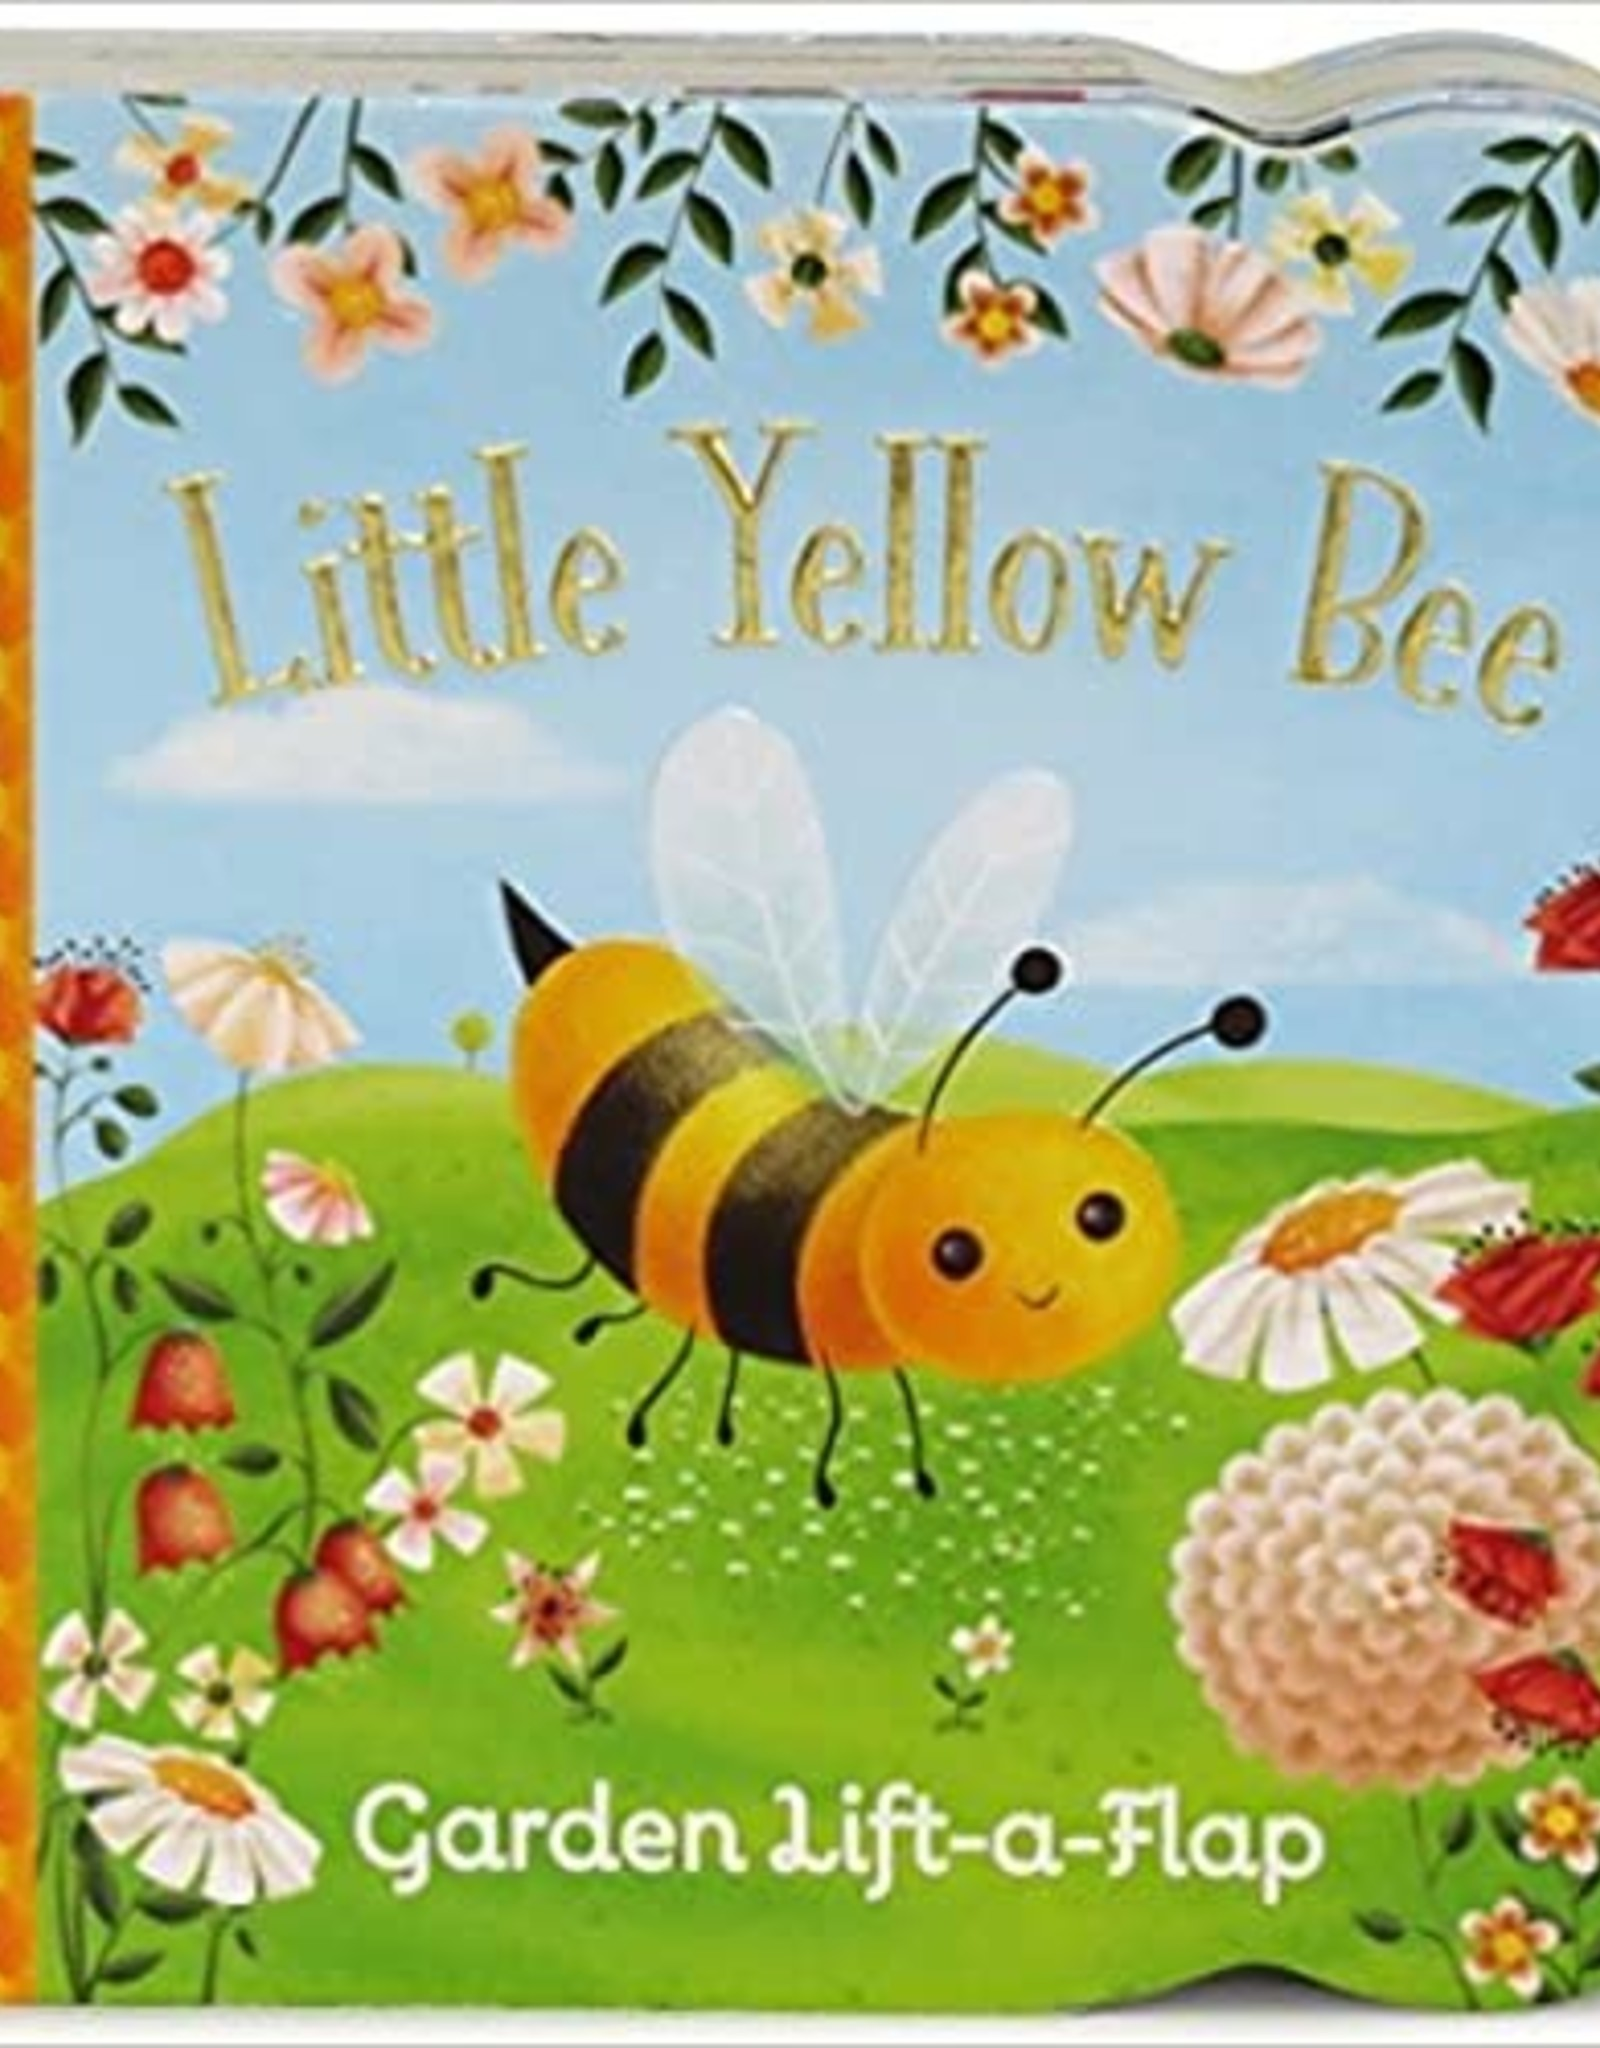 - Little Yellow Bee Board Book